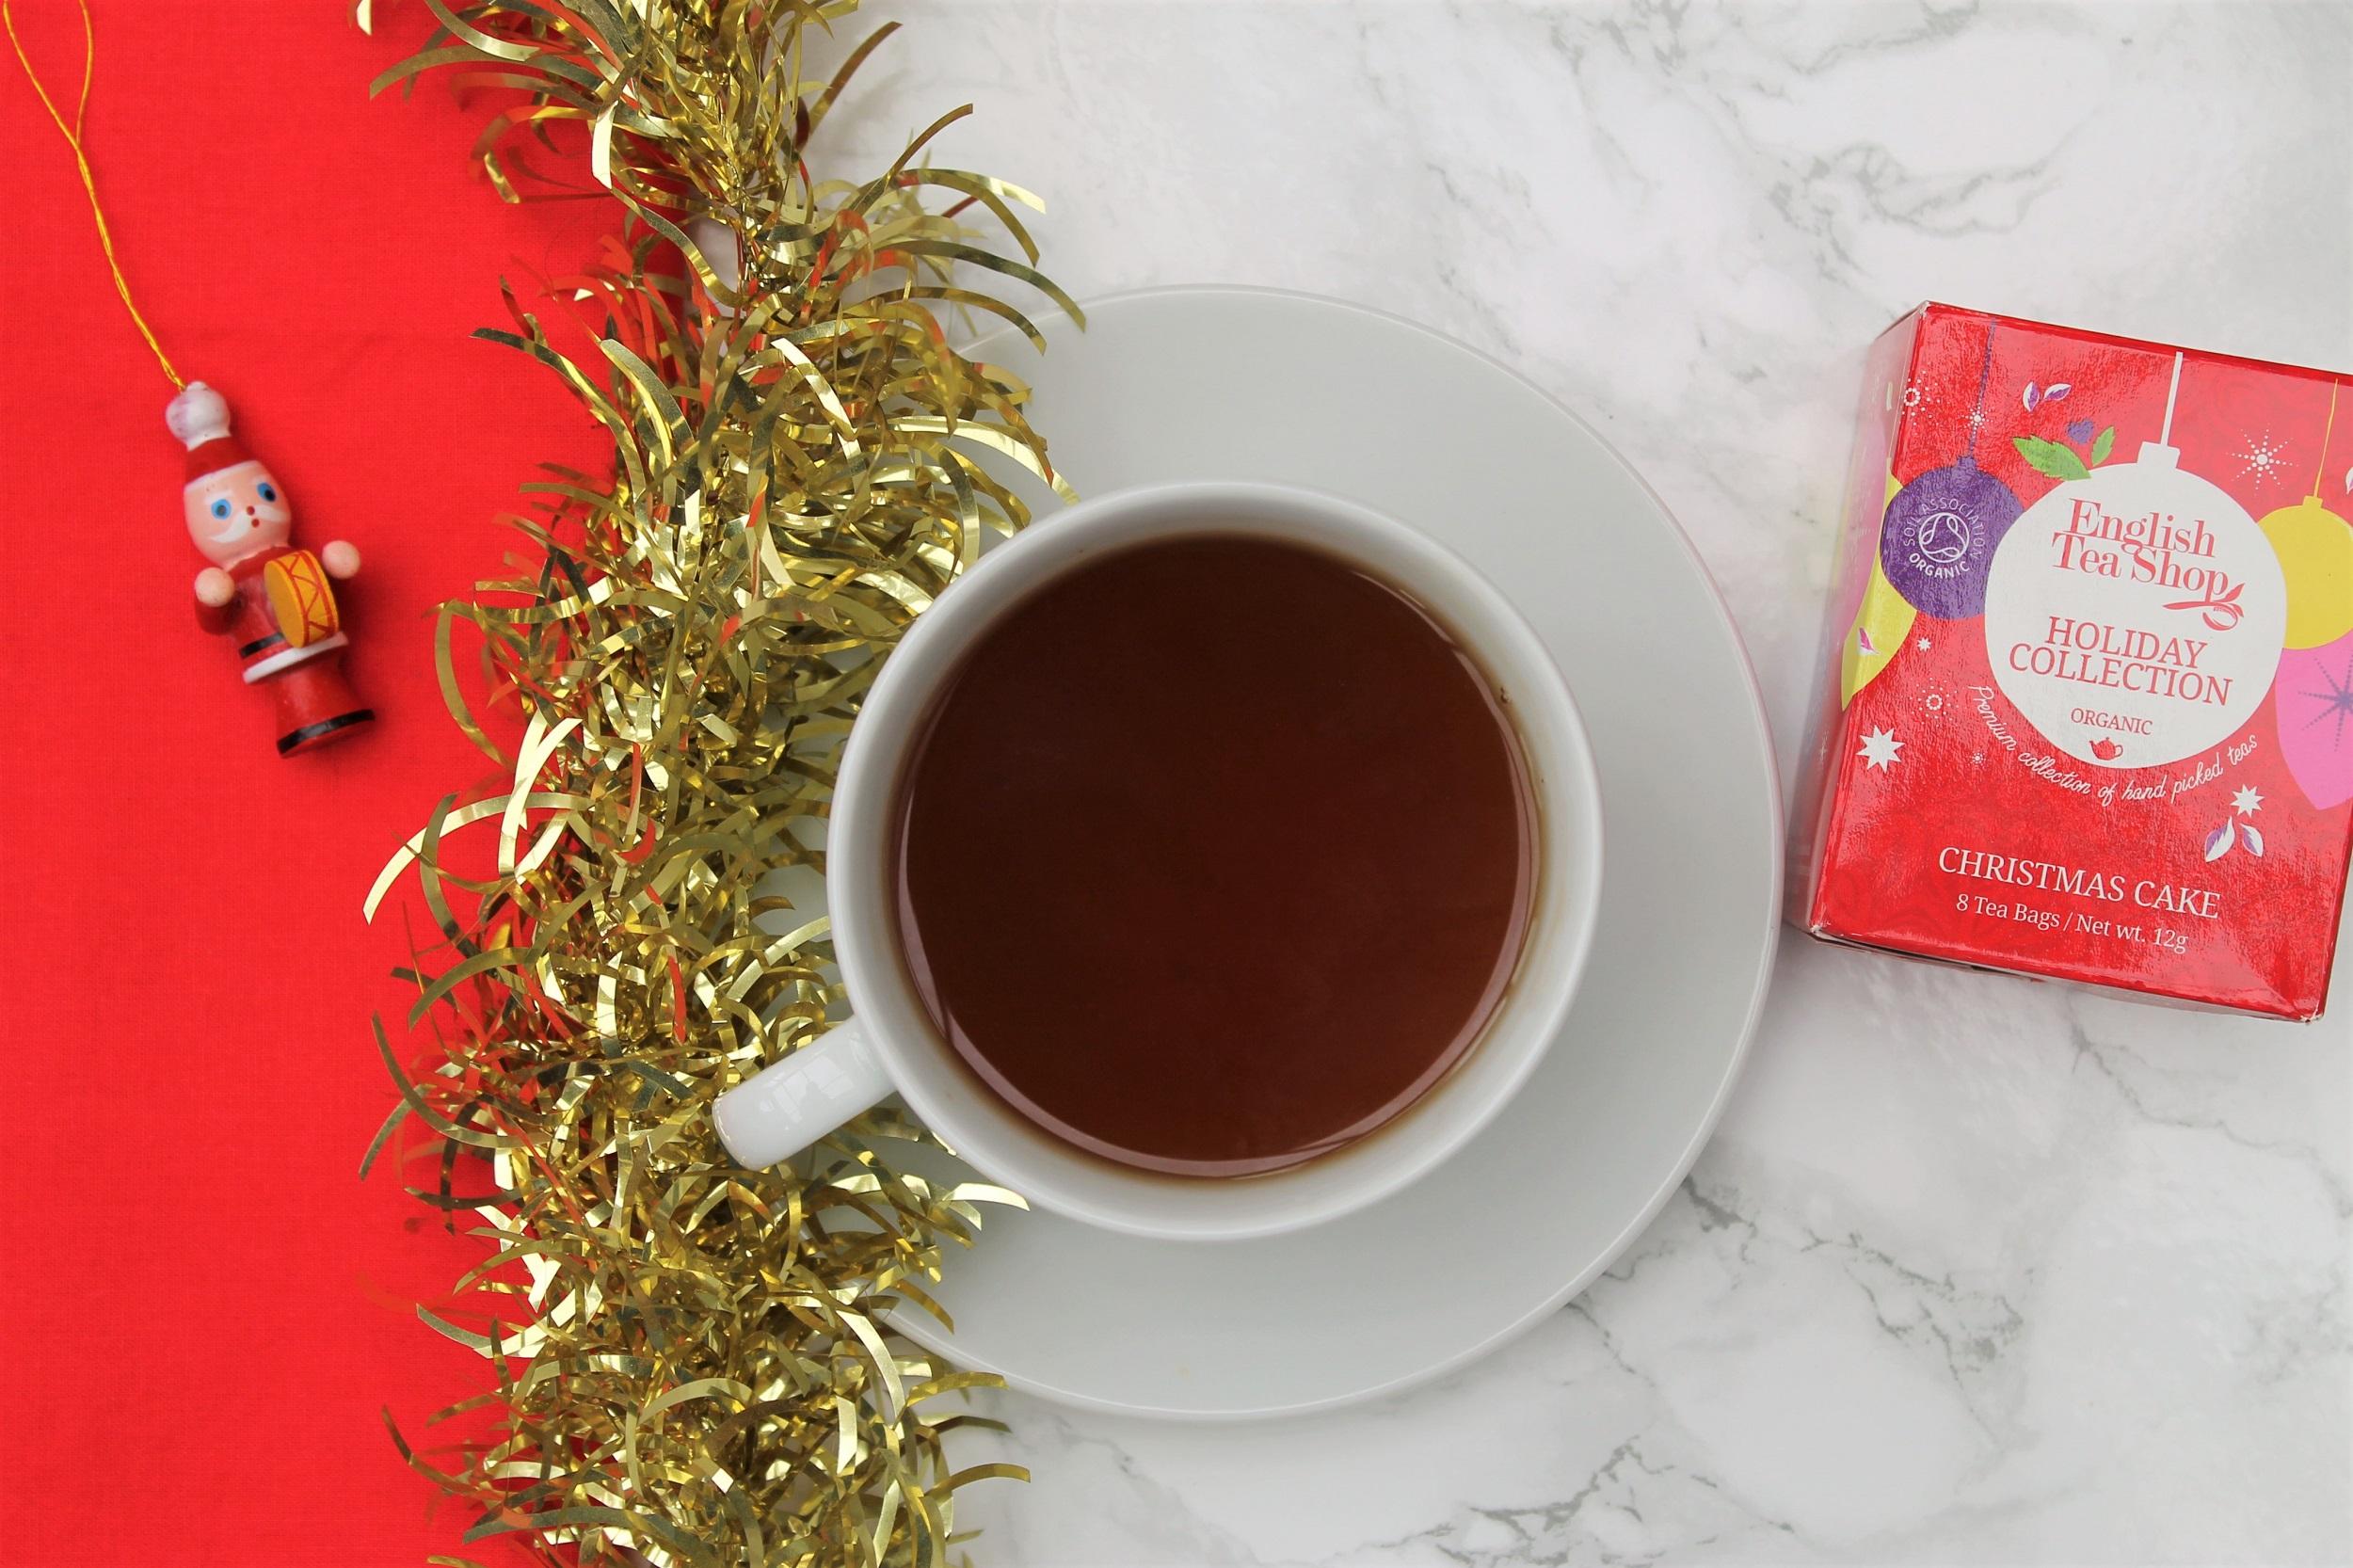 English Tea Shop Christmas Cake Tea Review